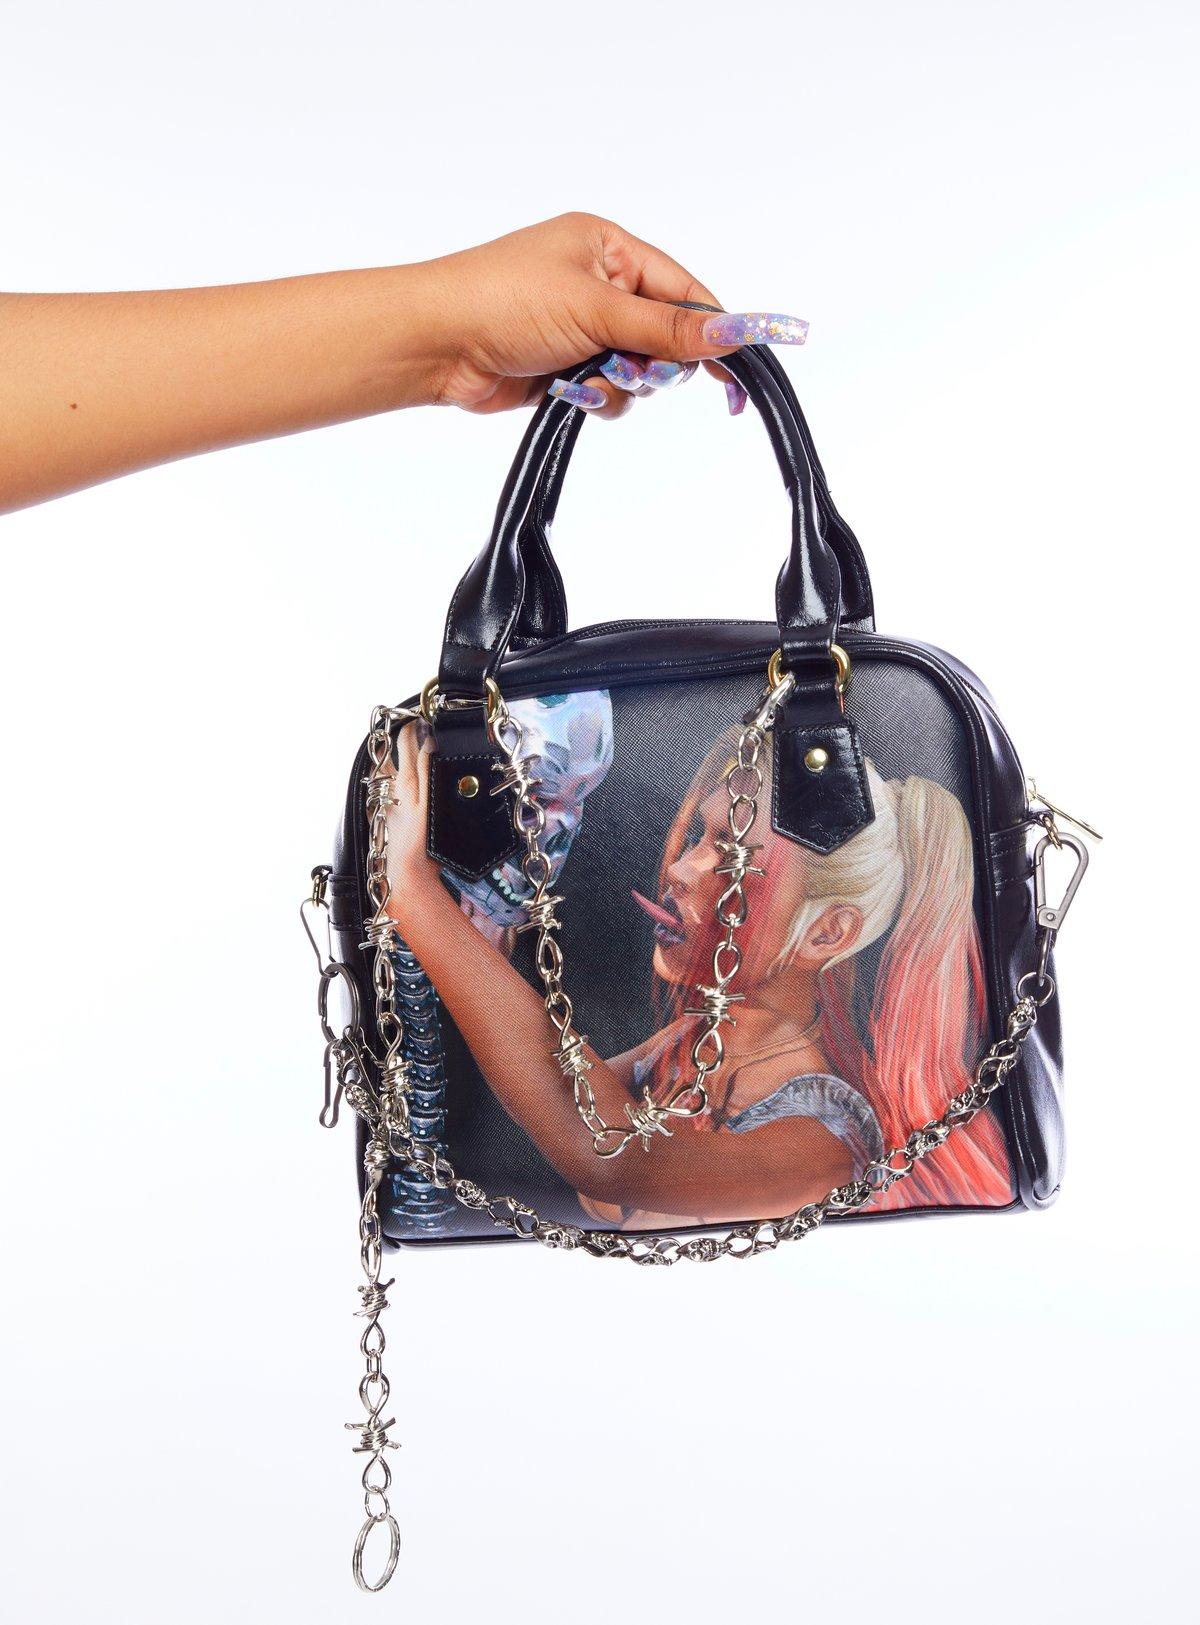 Bite It bag